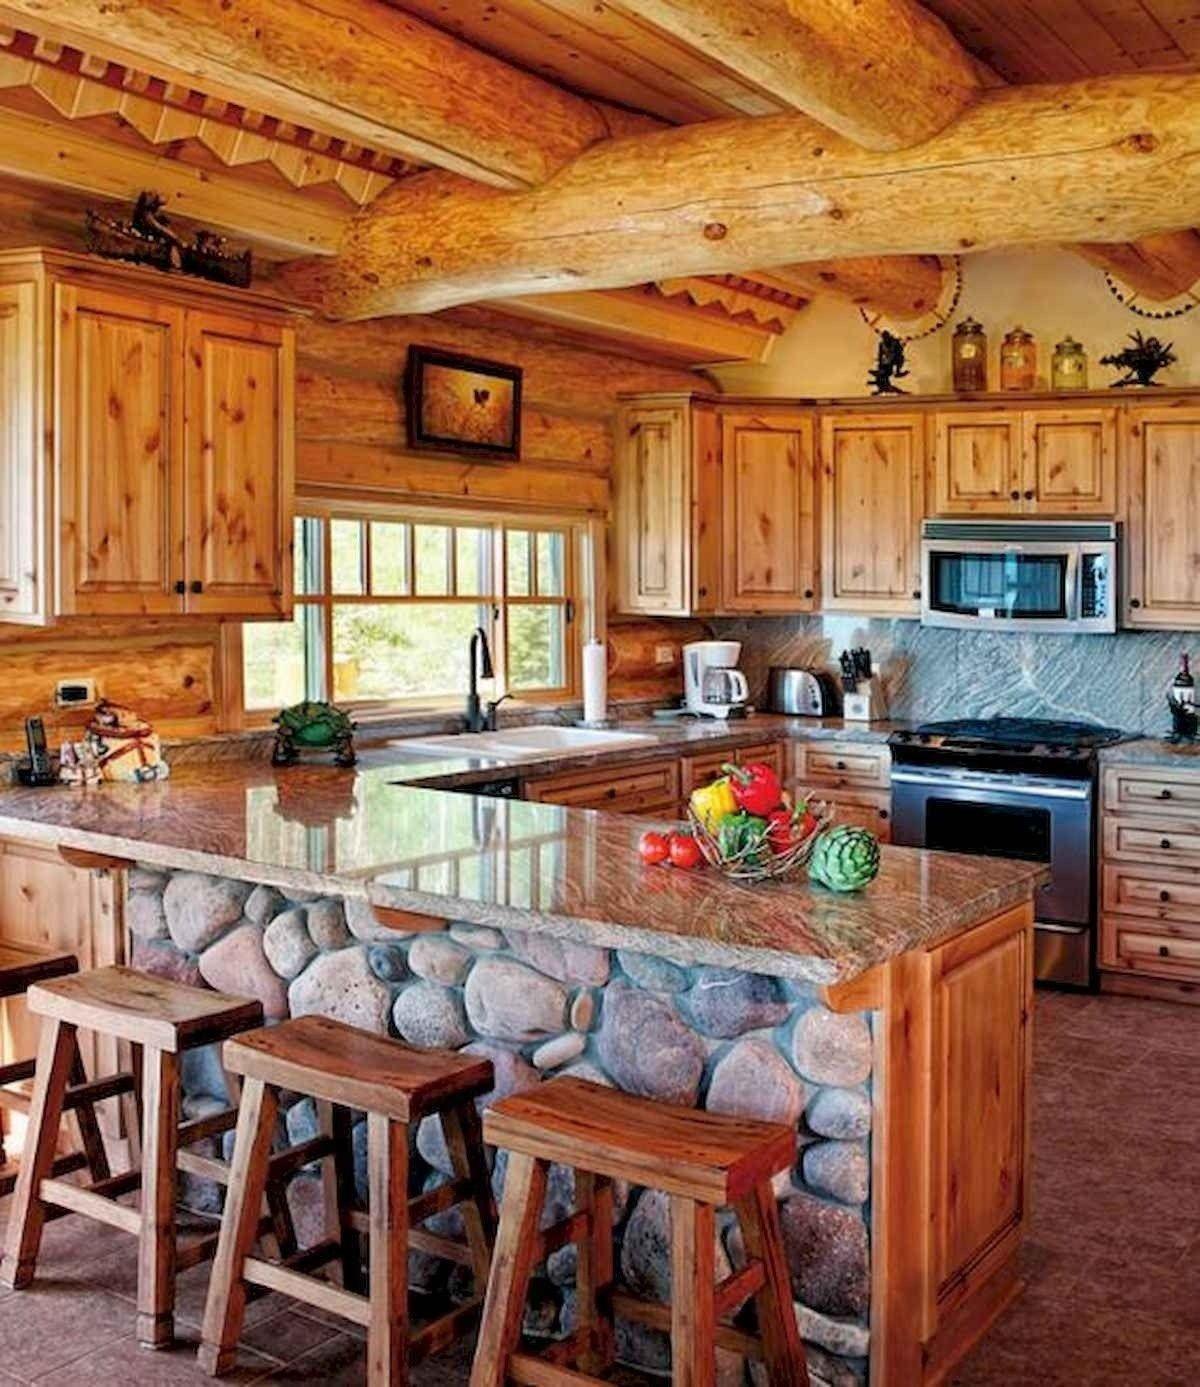 50 Best Log Cabin Homes Modern Design Ideas 31 In 2020 Cabin Interior Design Log Home Kitchens Log Cabin Interior